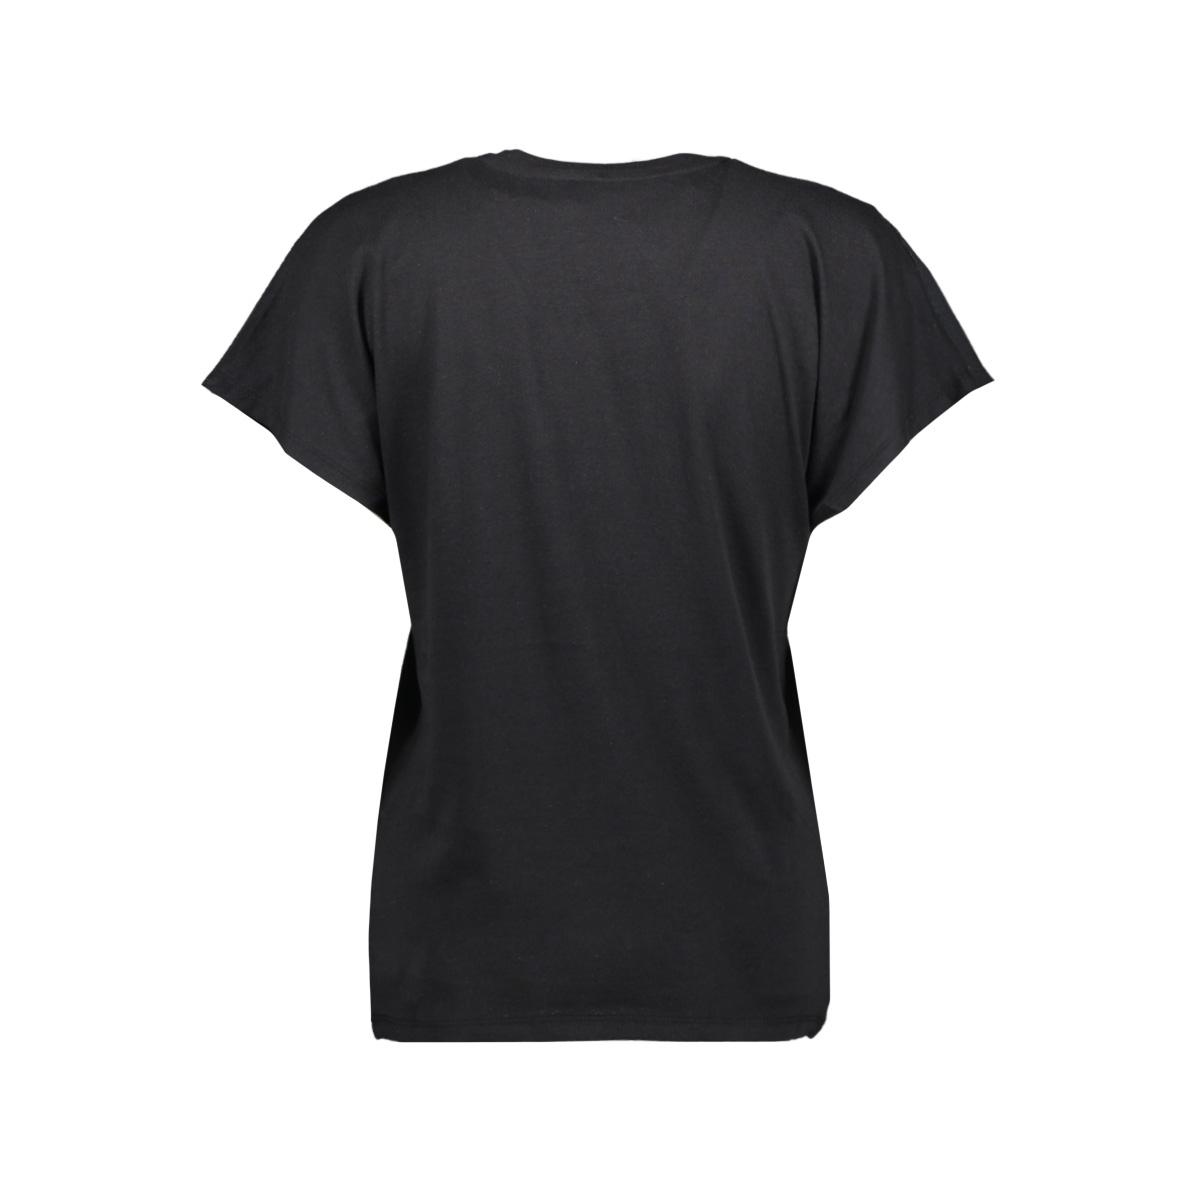 onlcarin reg bat s/s chain mix top 15193290 only t-shirt black/now